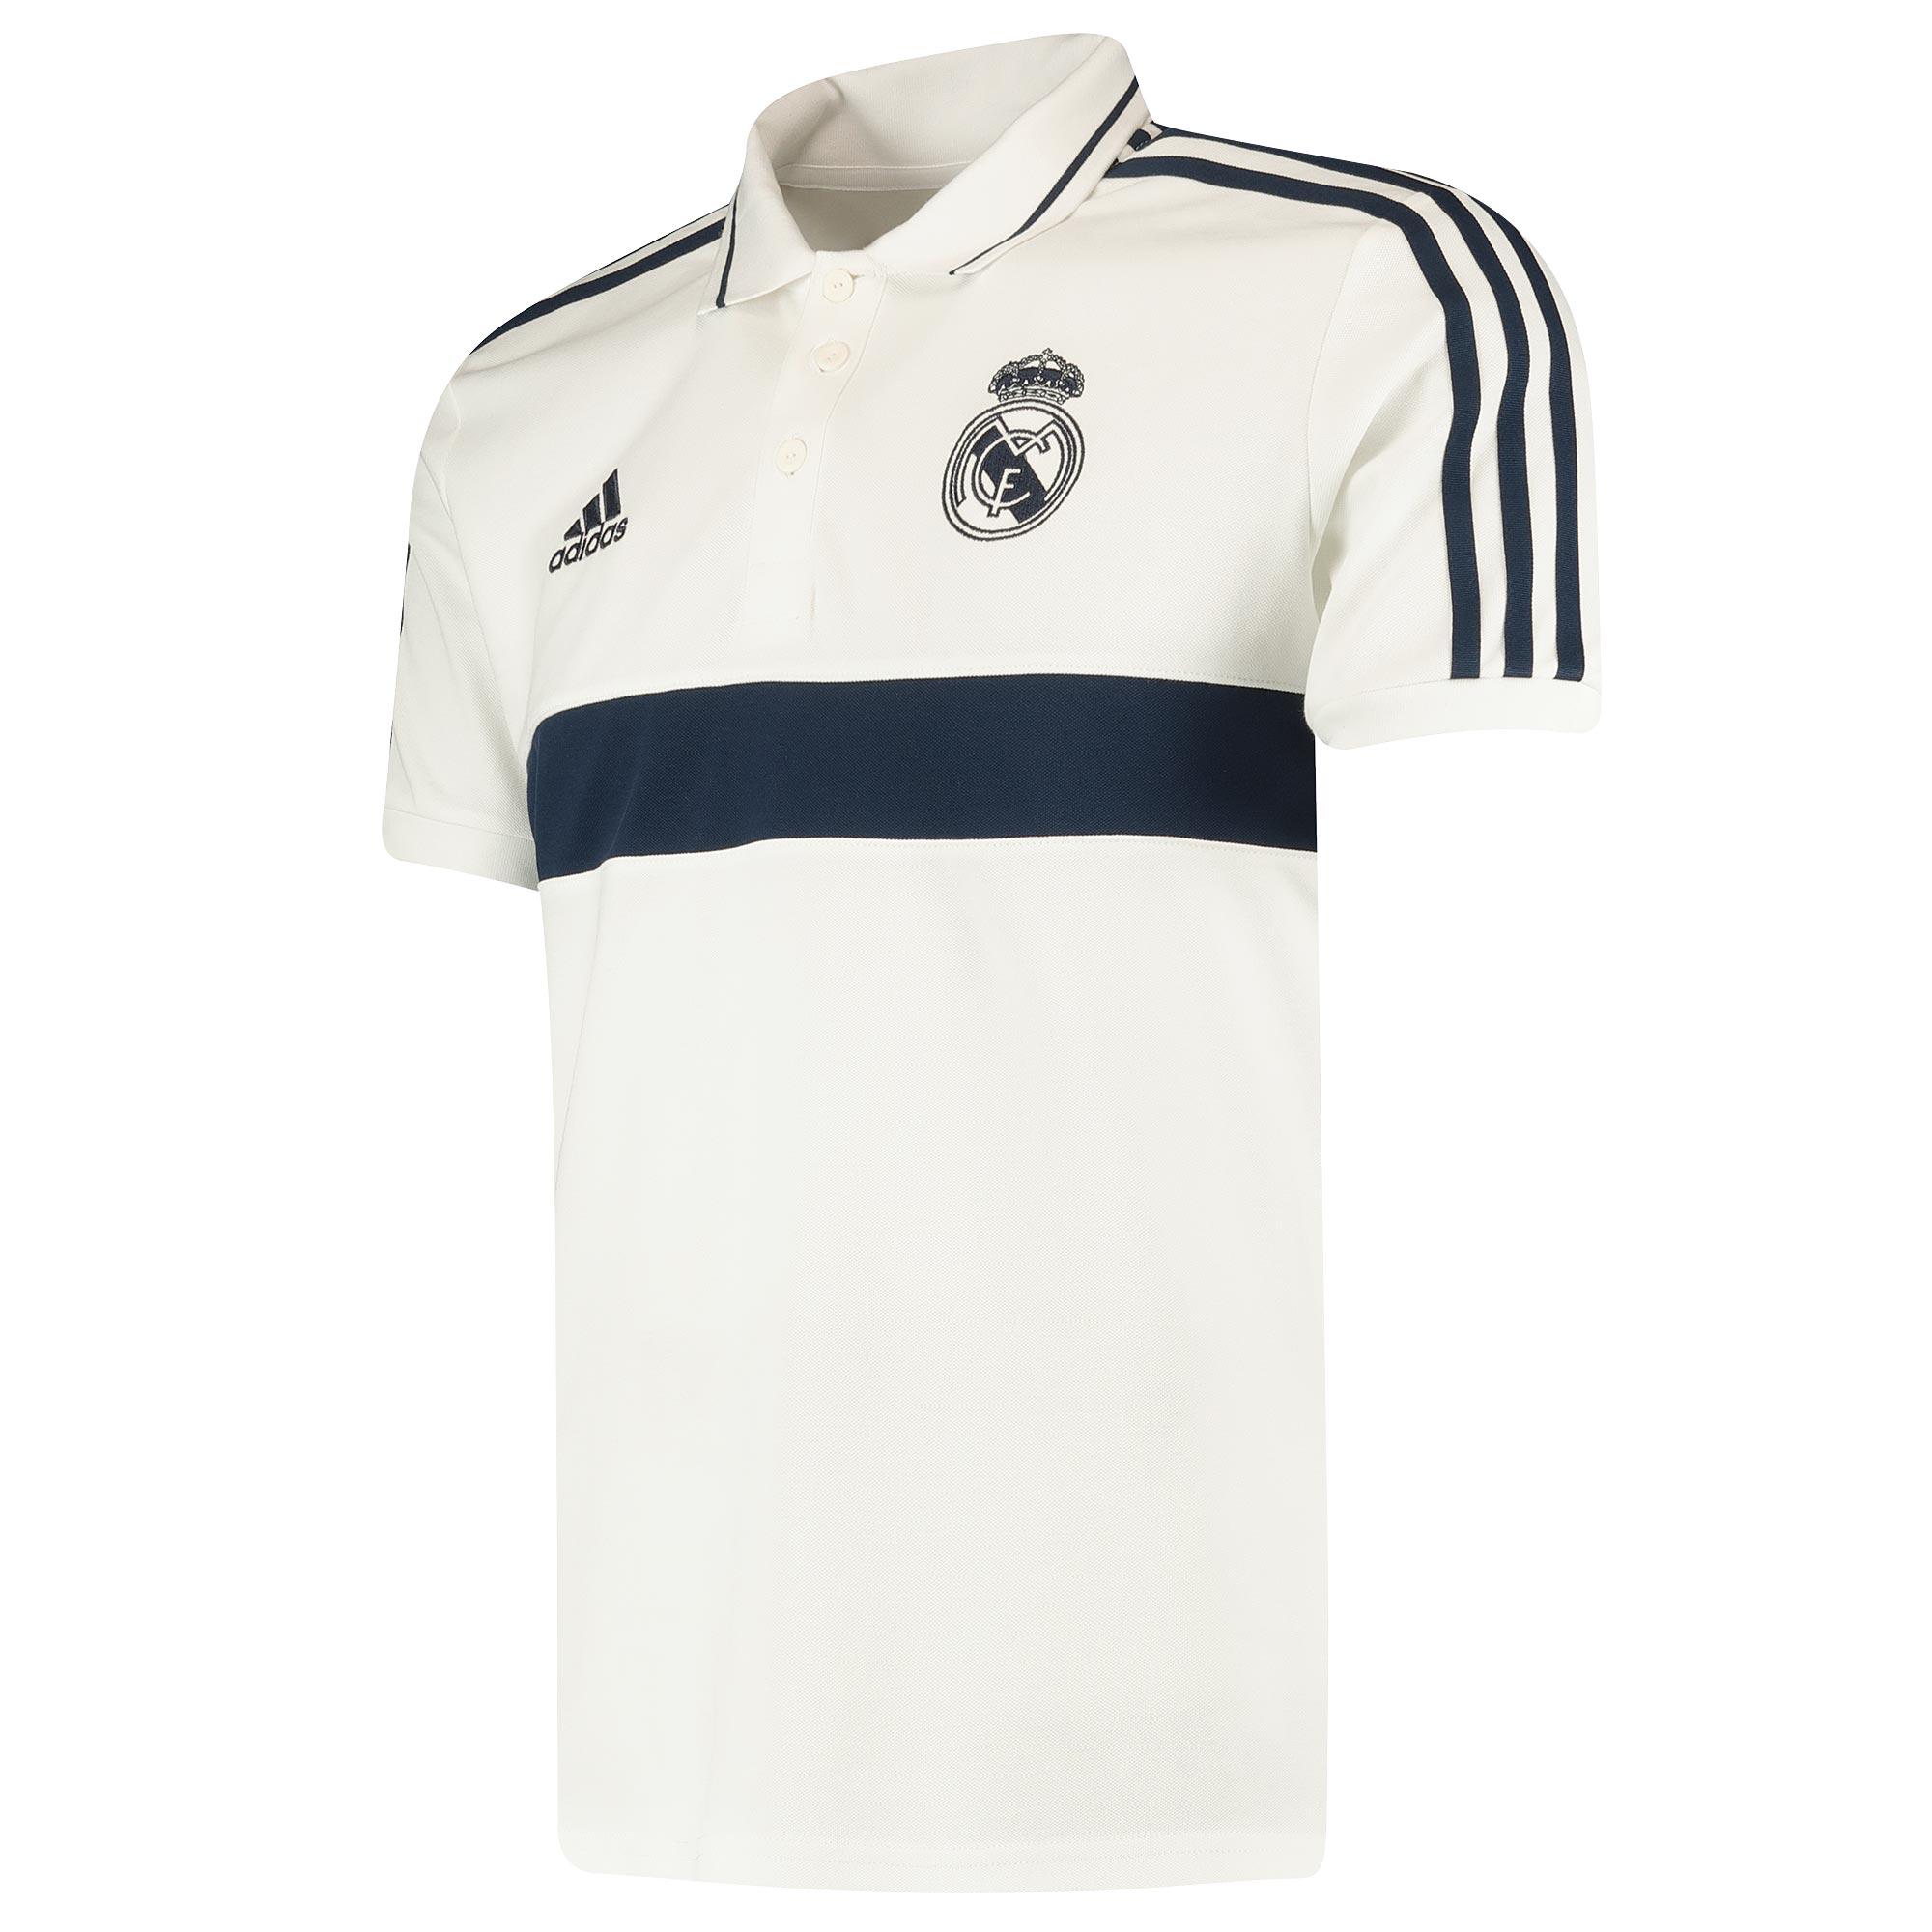 Polo informal del Real Madrid blanco